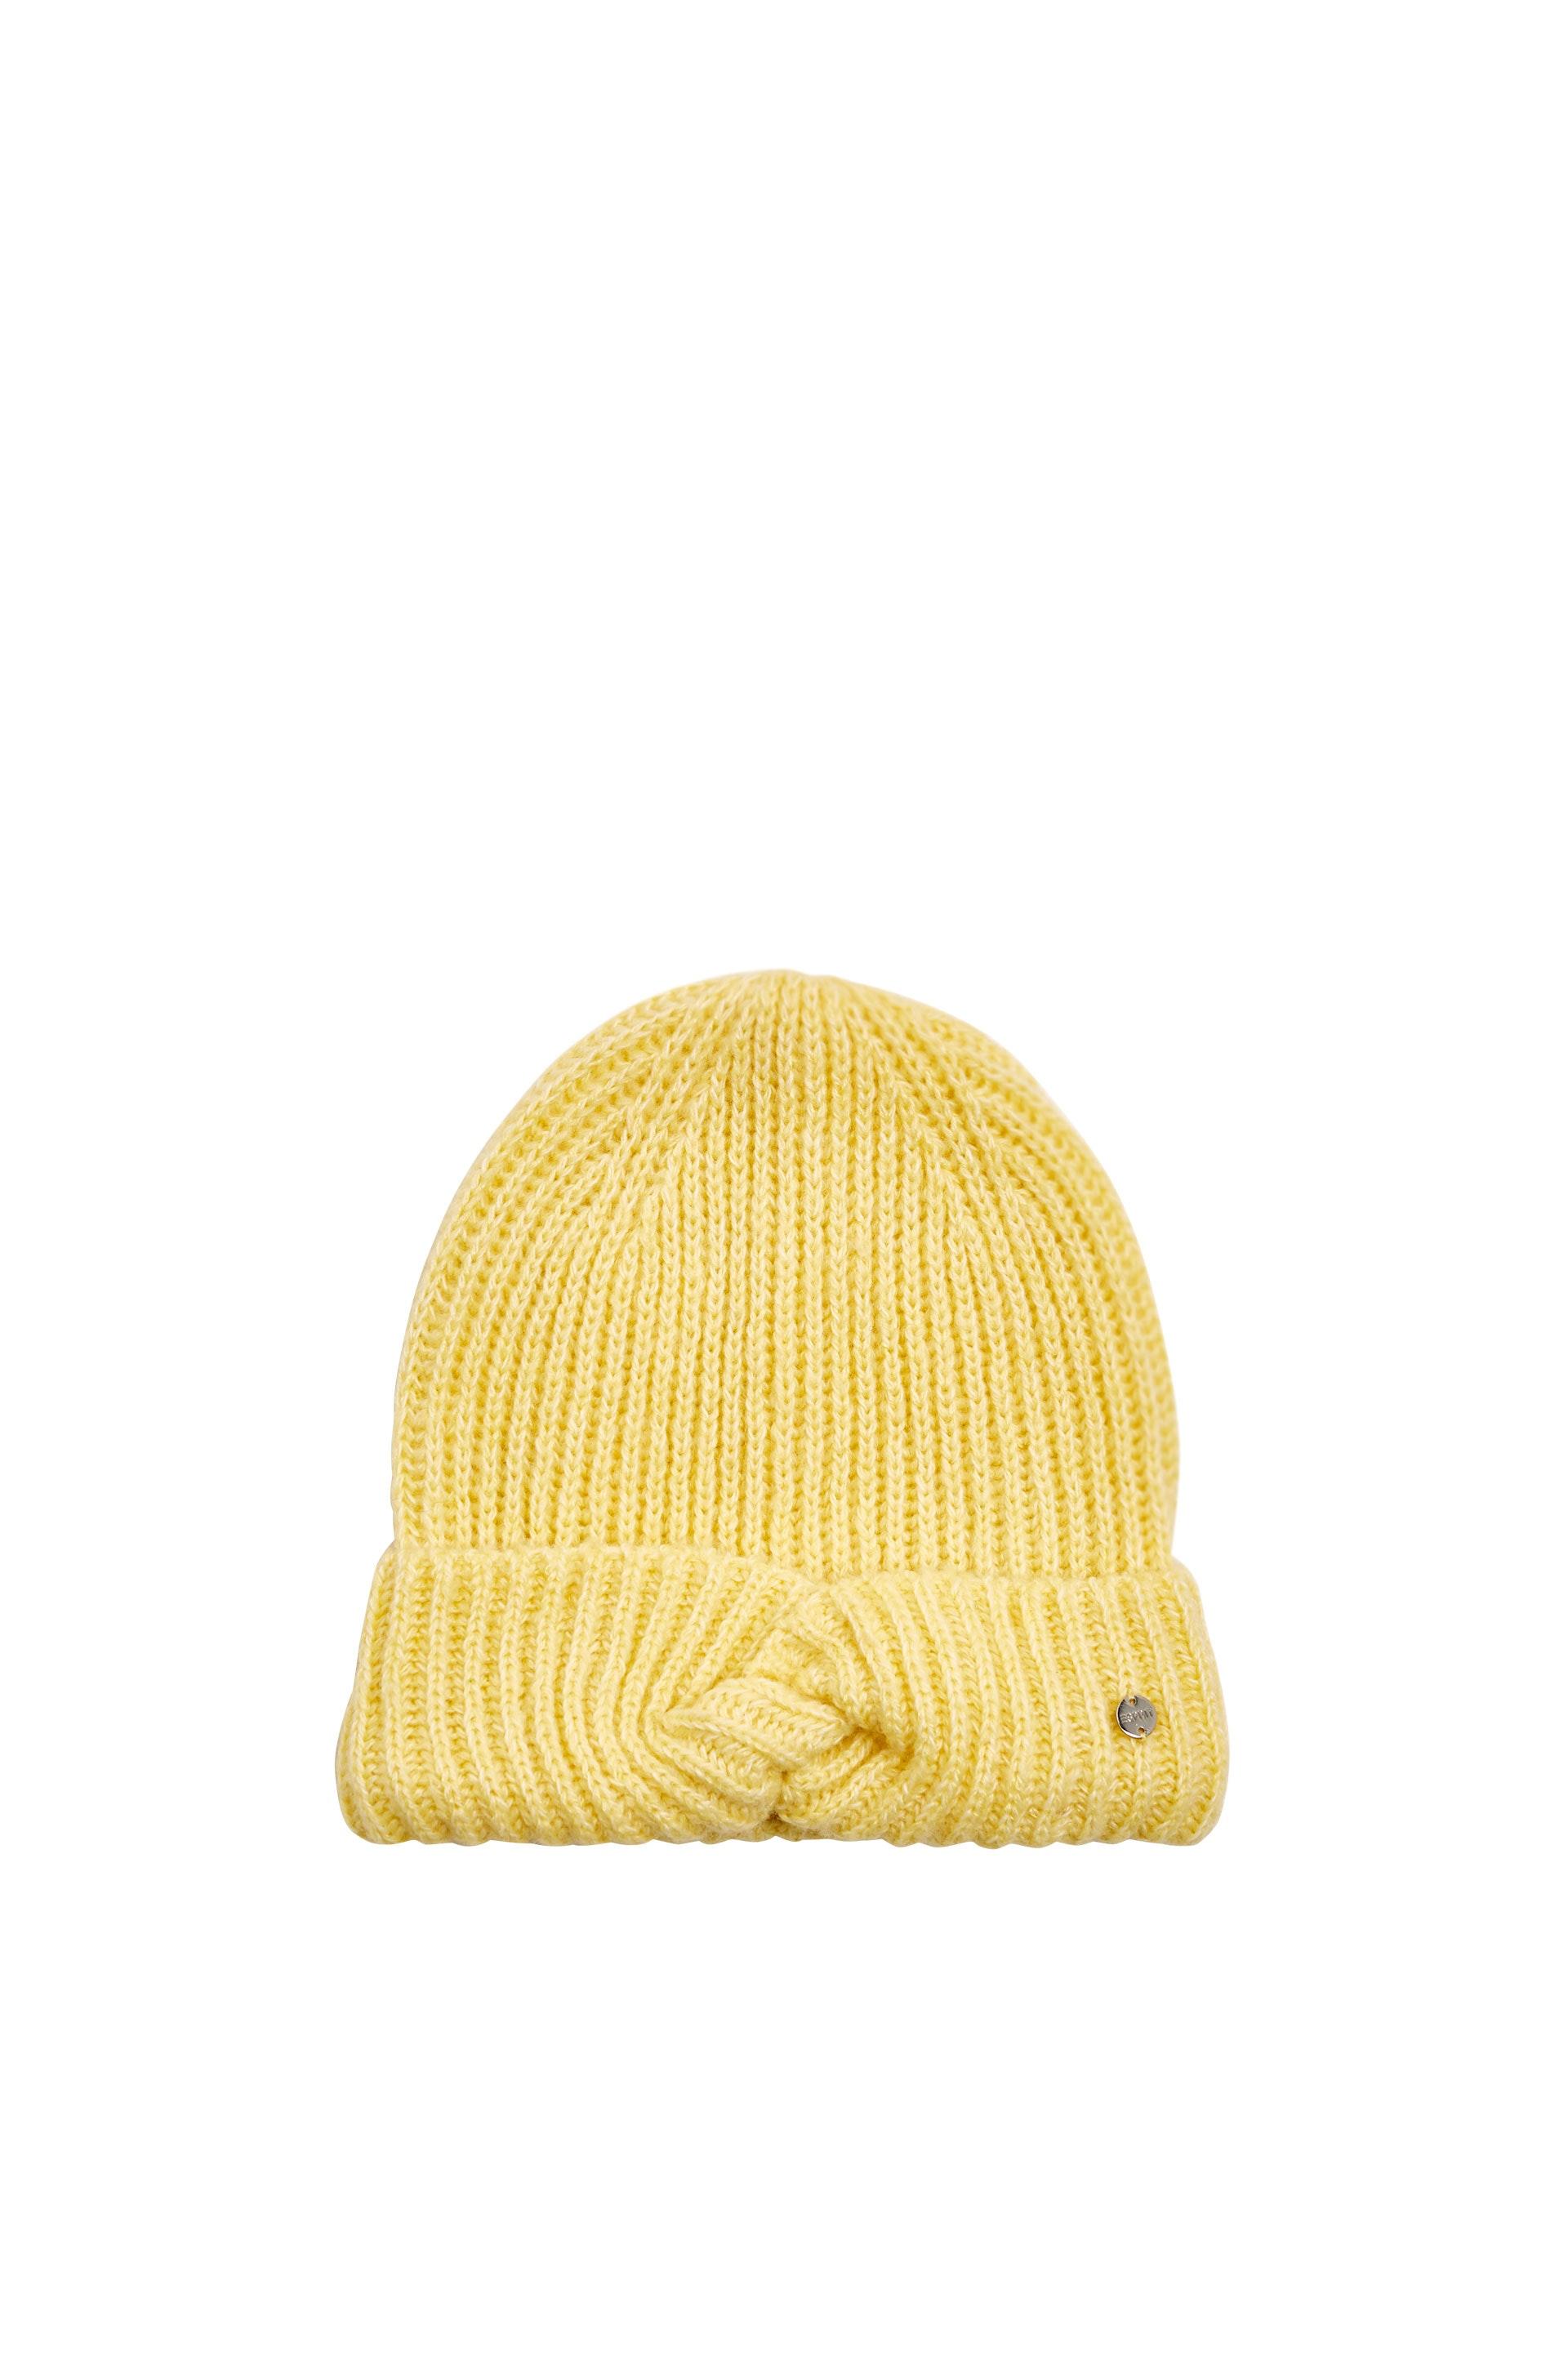 Women Hats/Caps beanies onesize